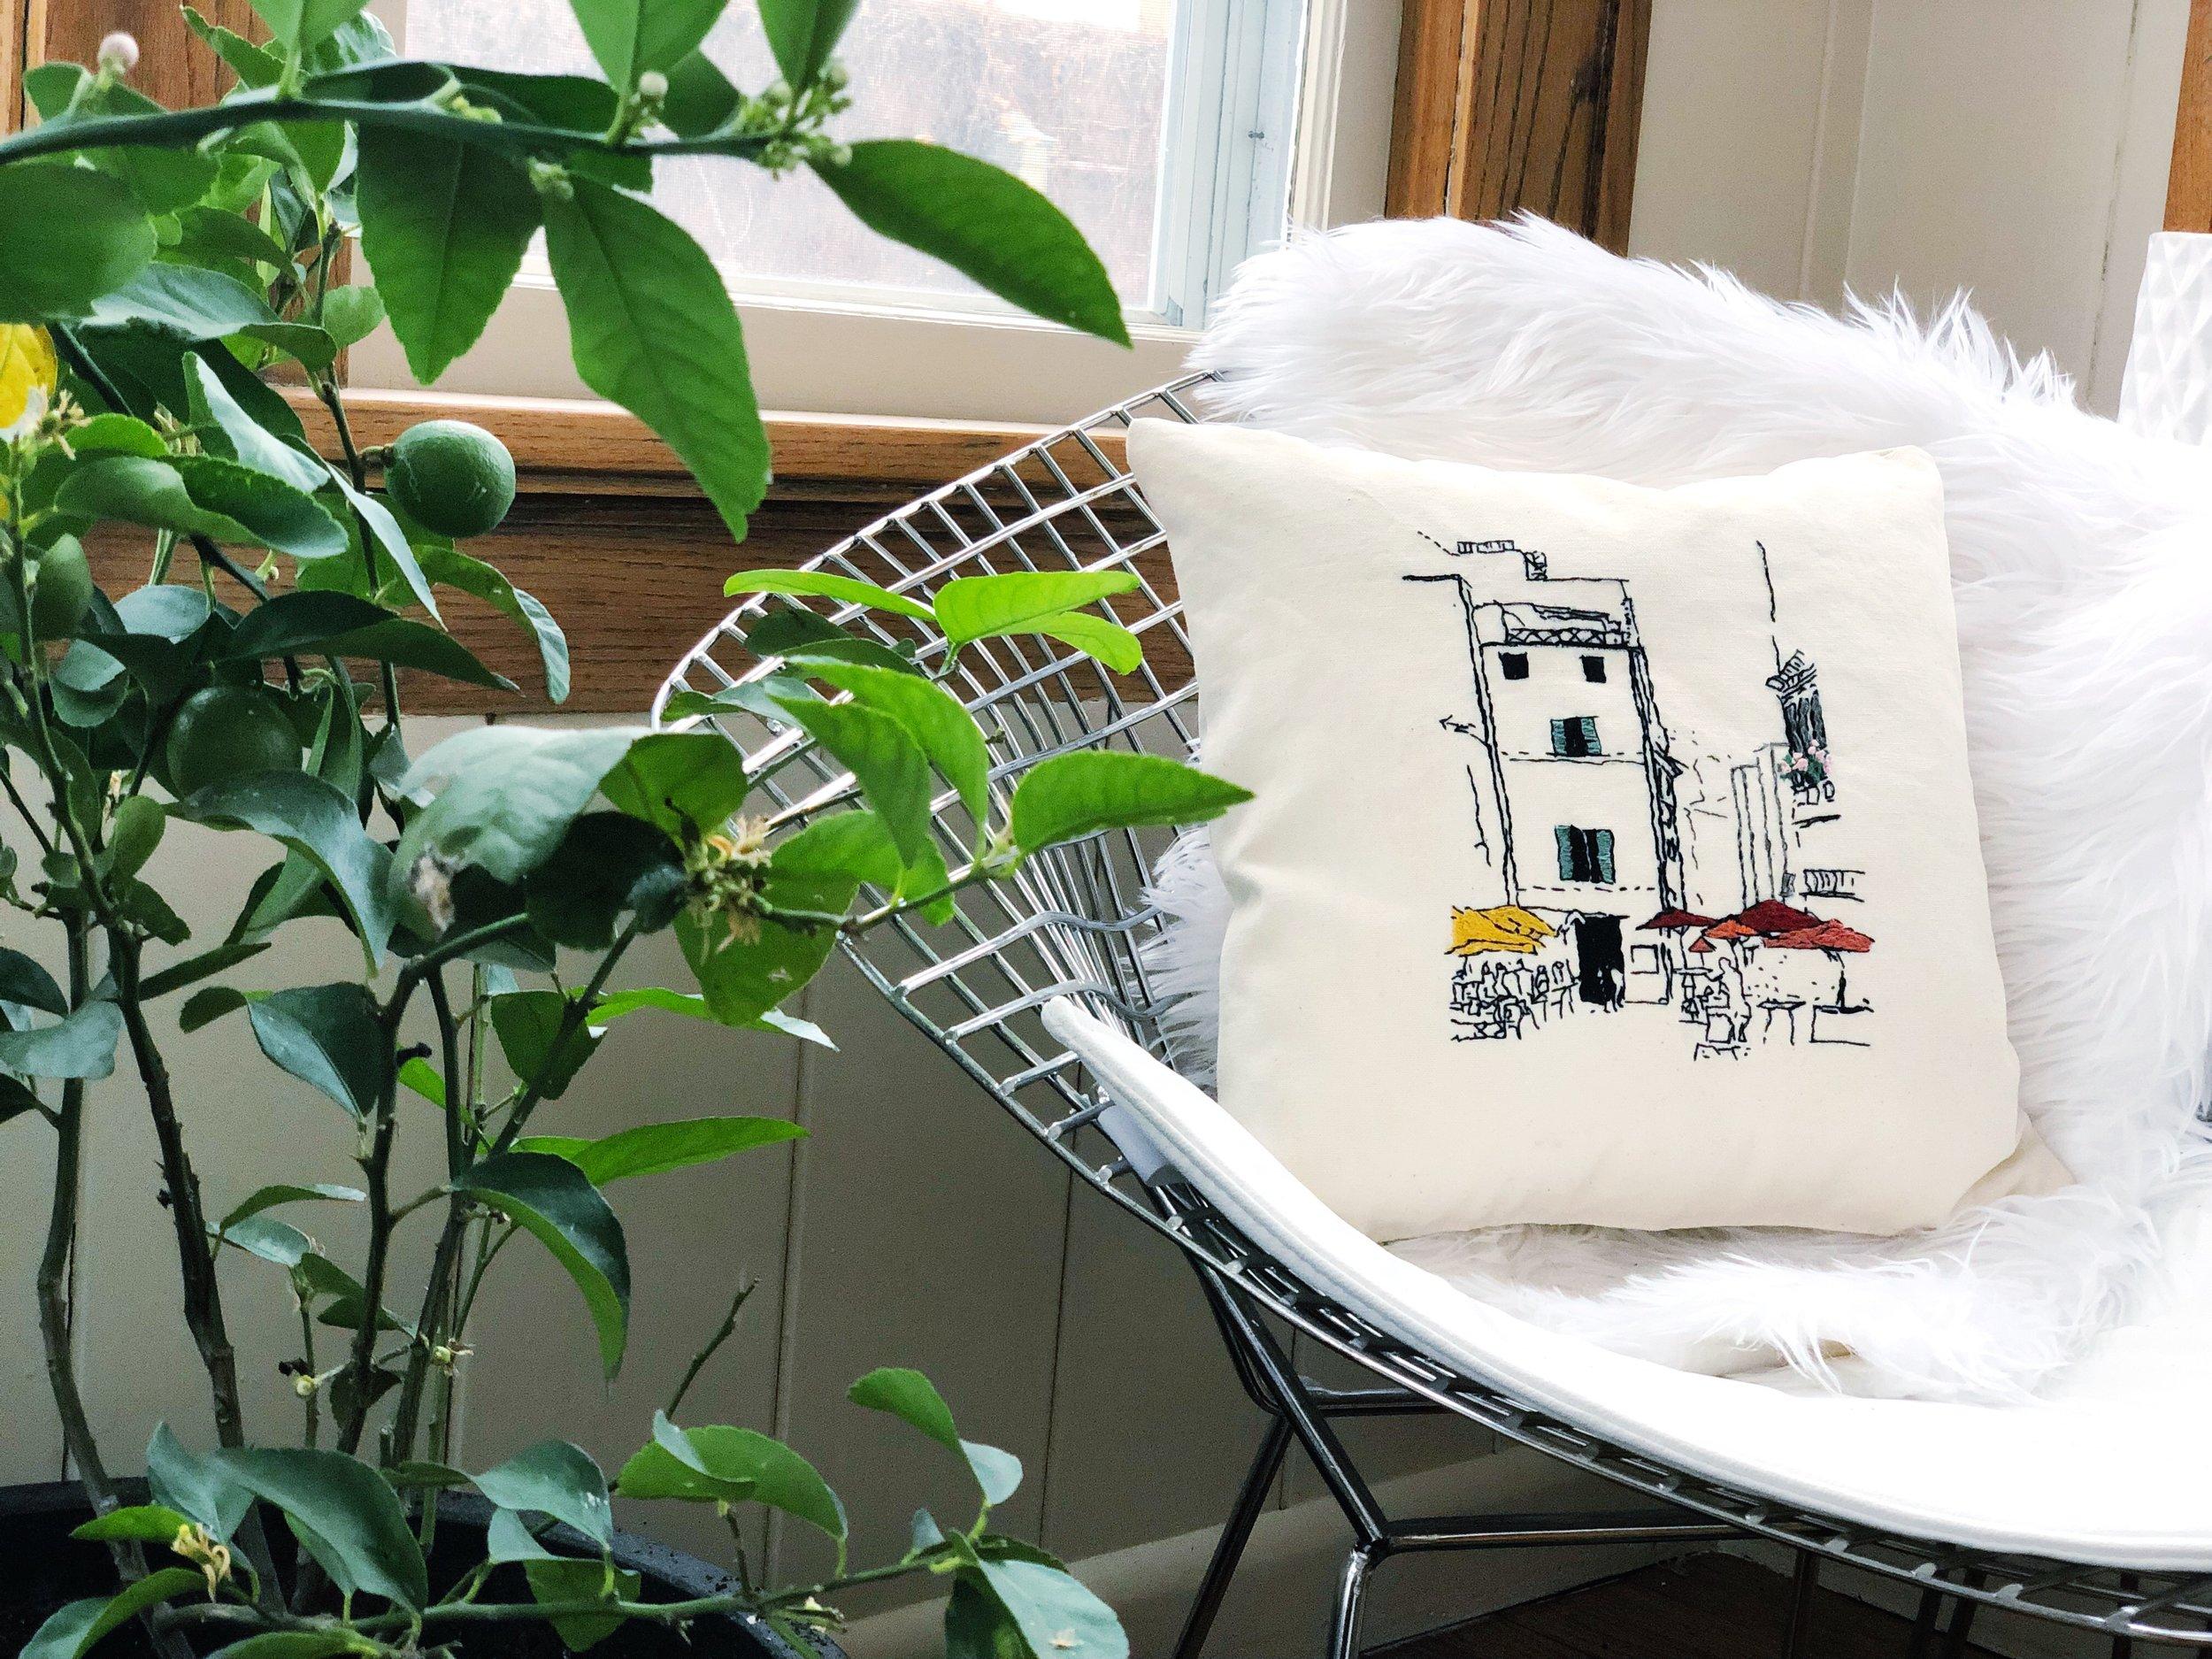 embroidery design diy throw pillow.JPG